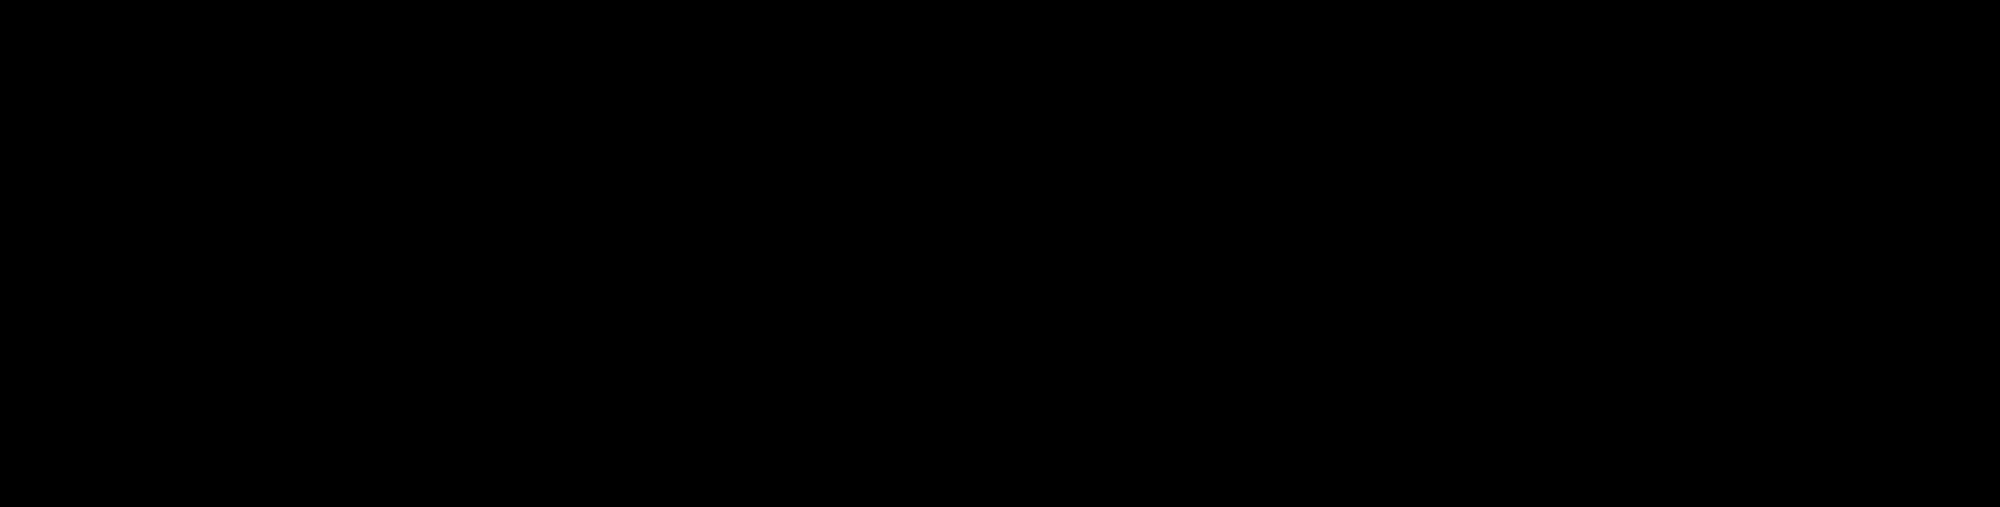 Montjalade-logo.png